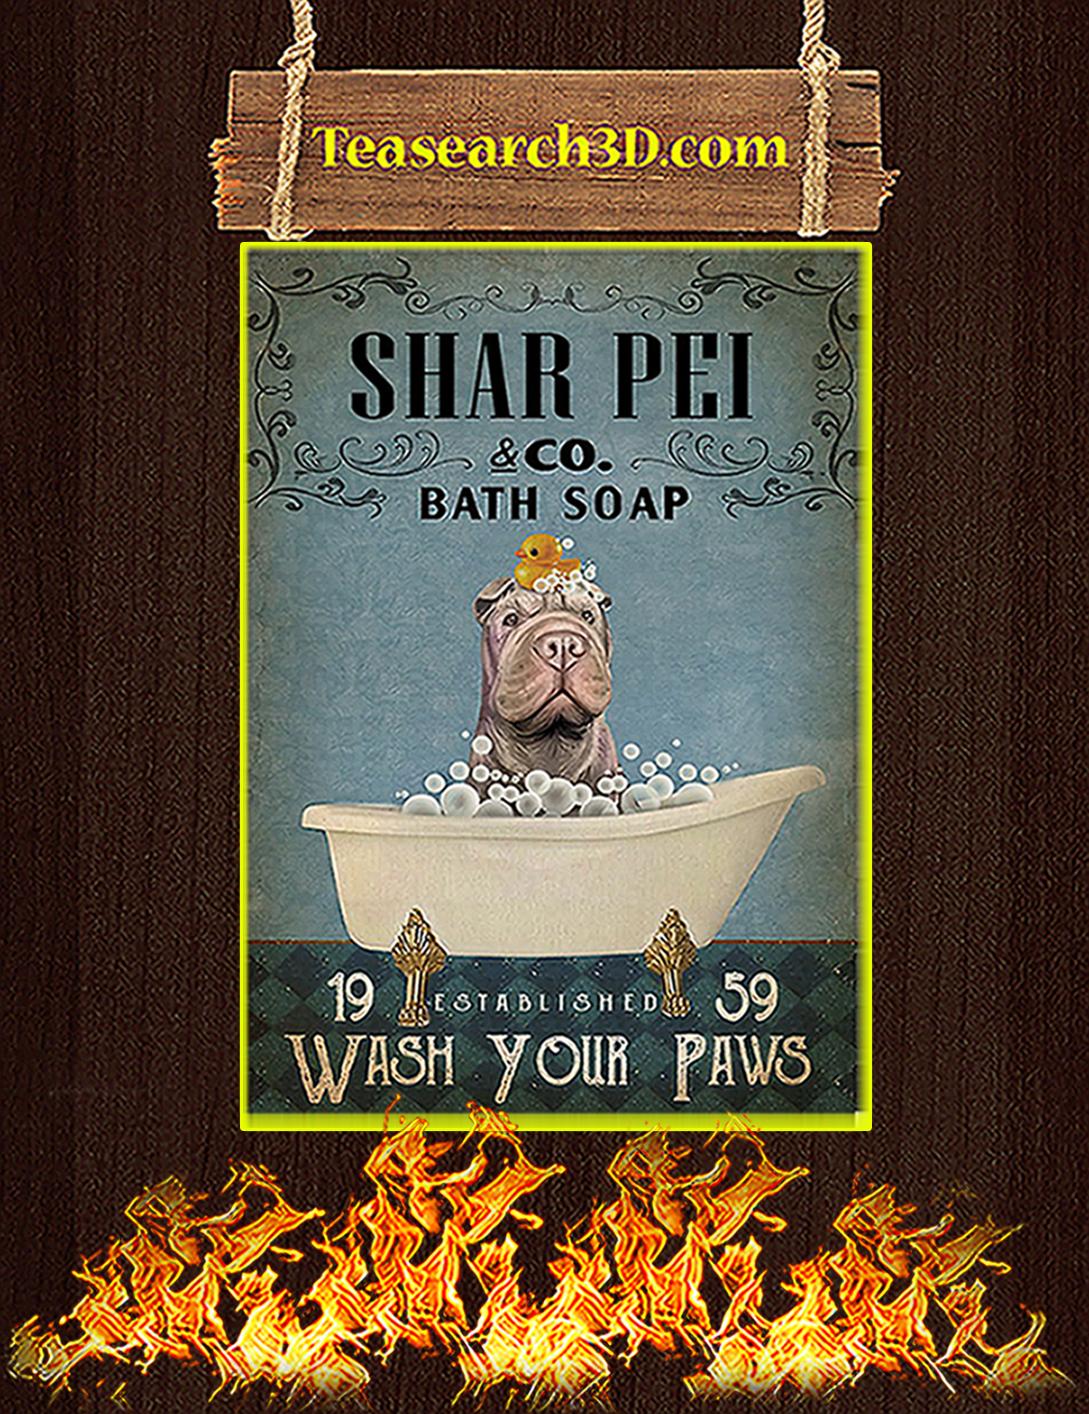 Bath Soap Company Shar Pei Poster A2